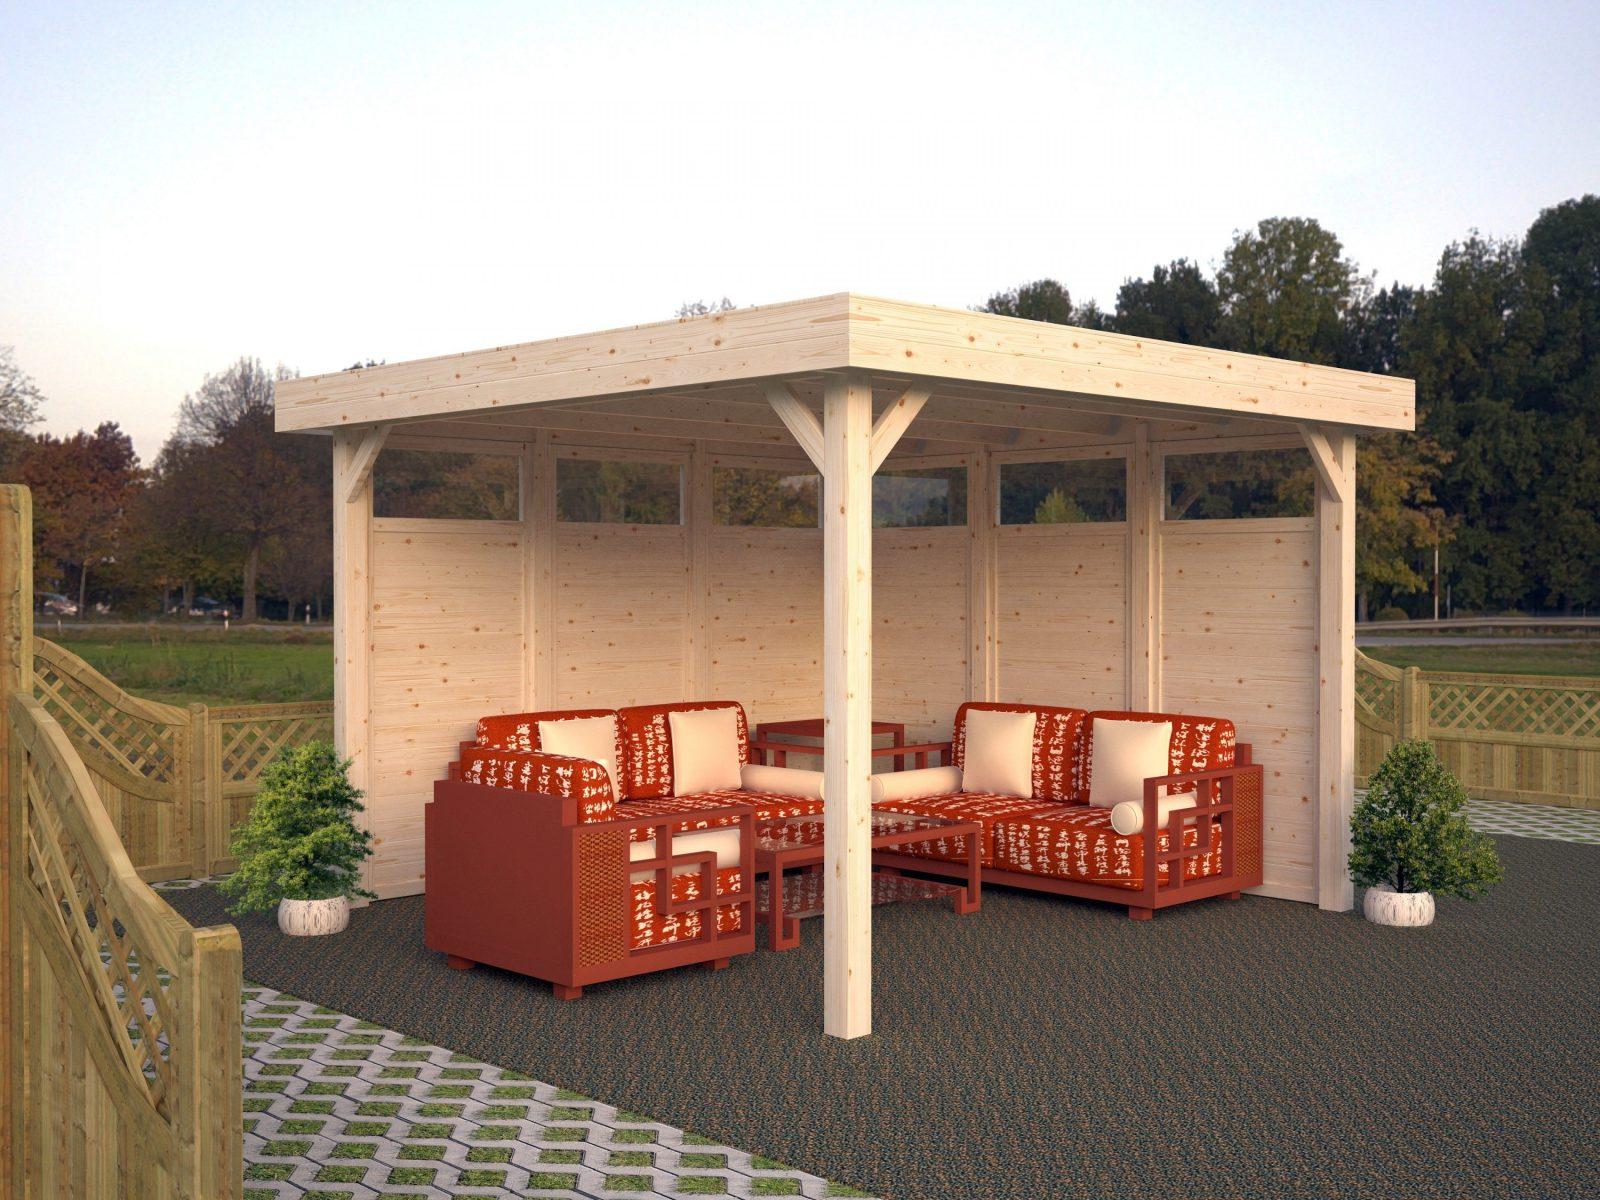 Holzpavillon Kaufen  Holzpavillonbausätze Vom Fachmann von Holz Pavillon Bausatz Günstig Bild